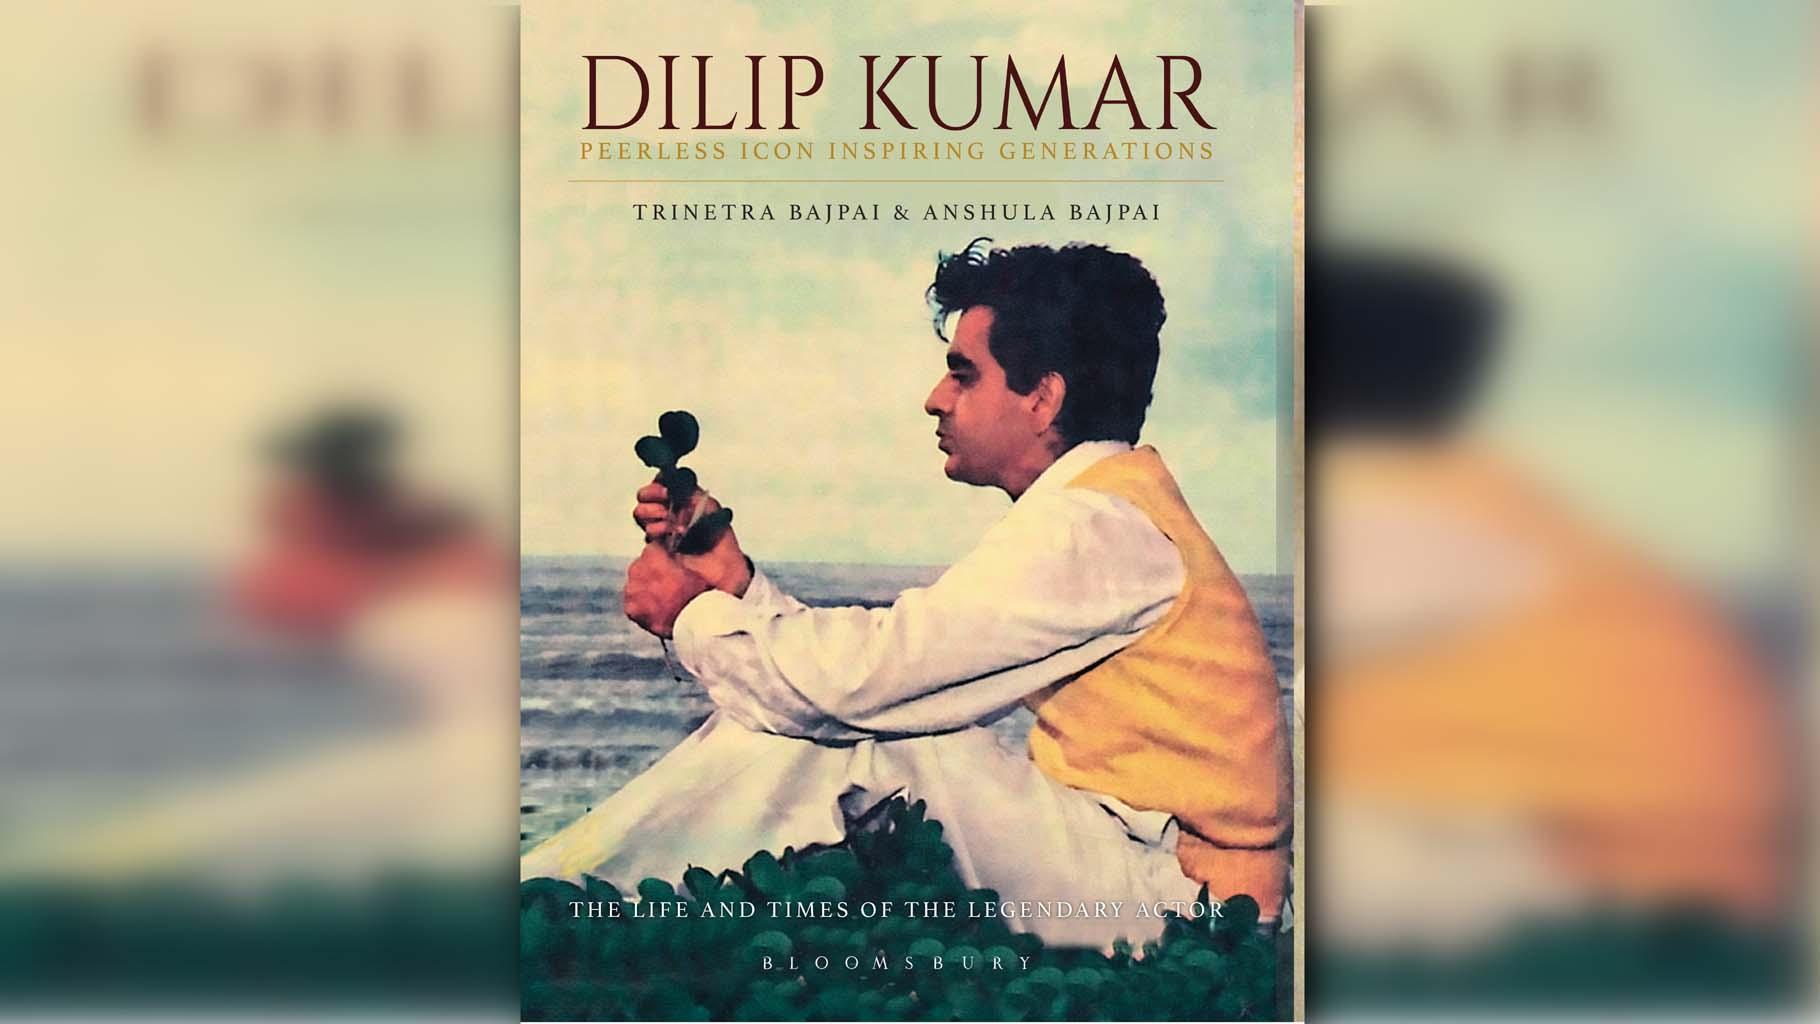 Book excerpt, Dilip kumar: peerless icon inspiring generations, Dilipkumar